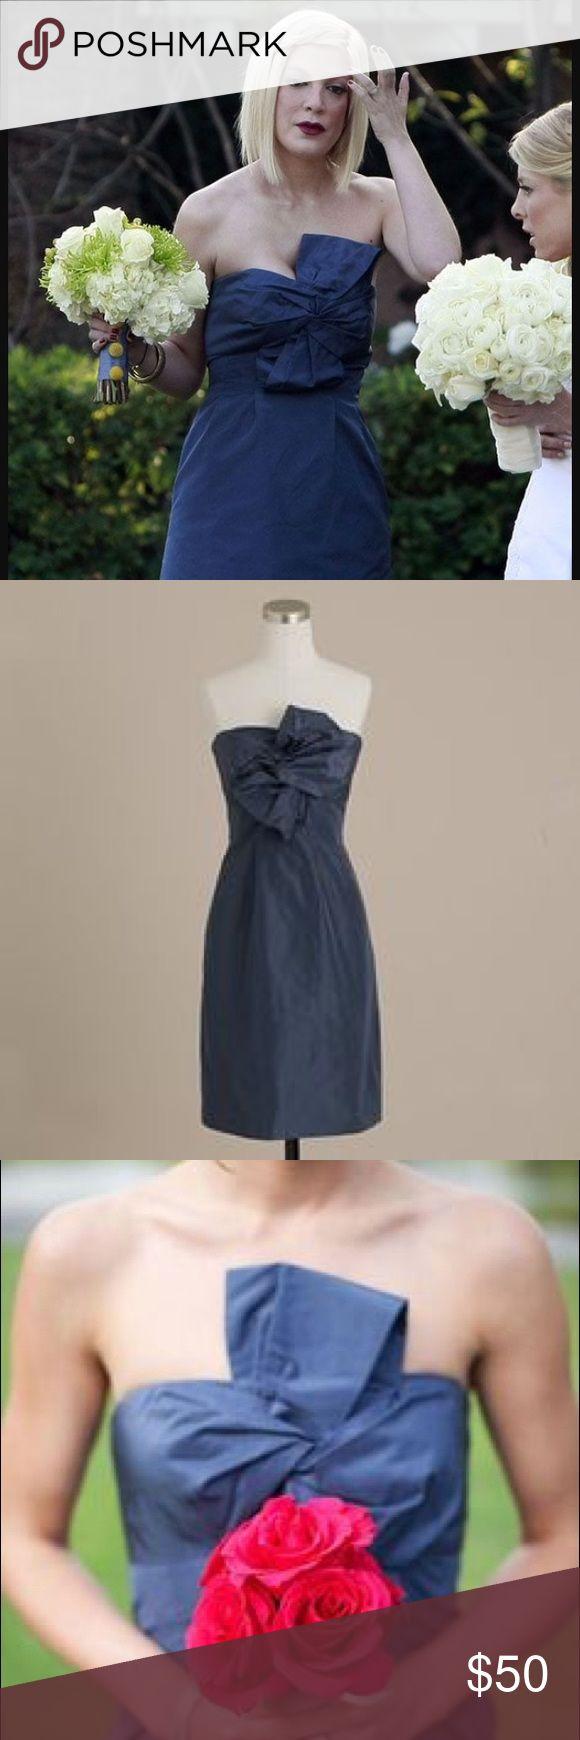 J Crew bridesmaid caspian blue Monde dress Worn once for a wedding! J. Crew Dresses Strapless